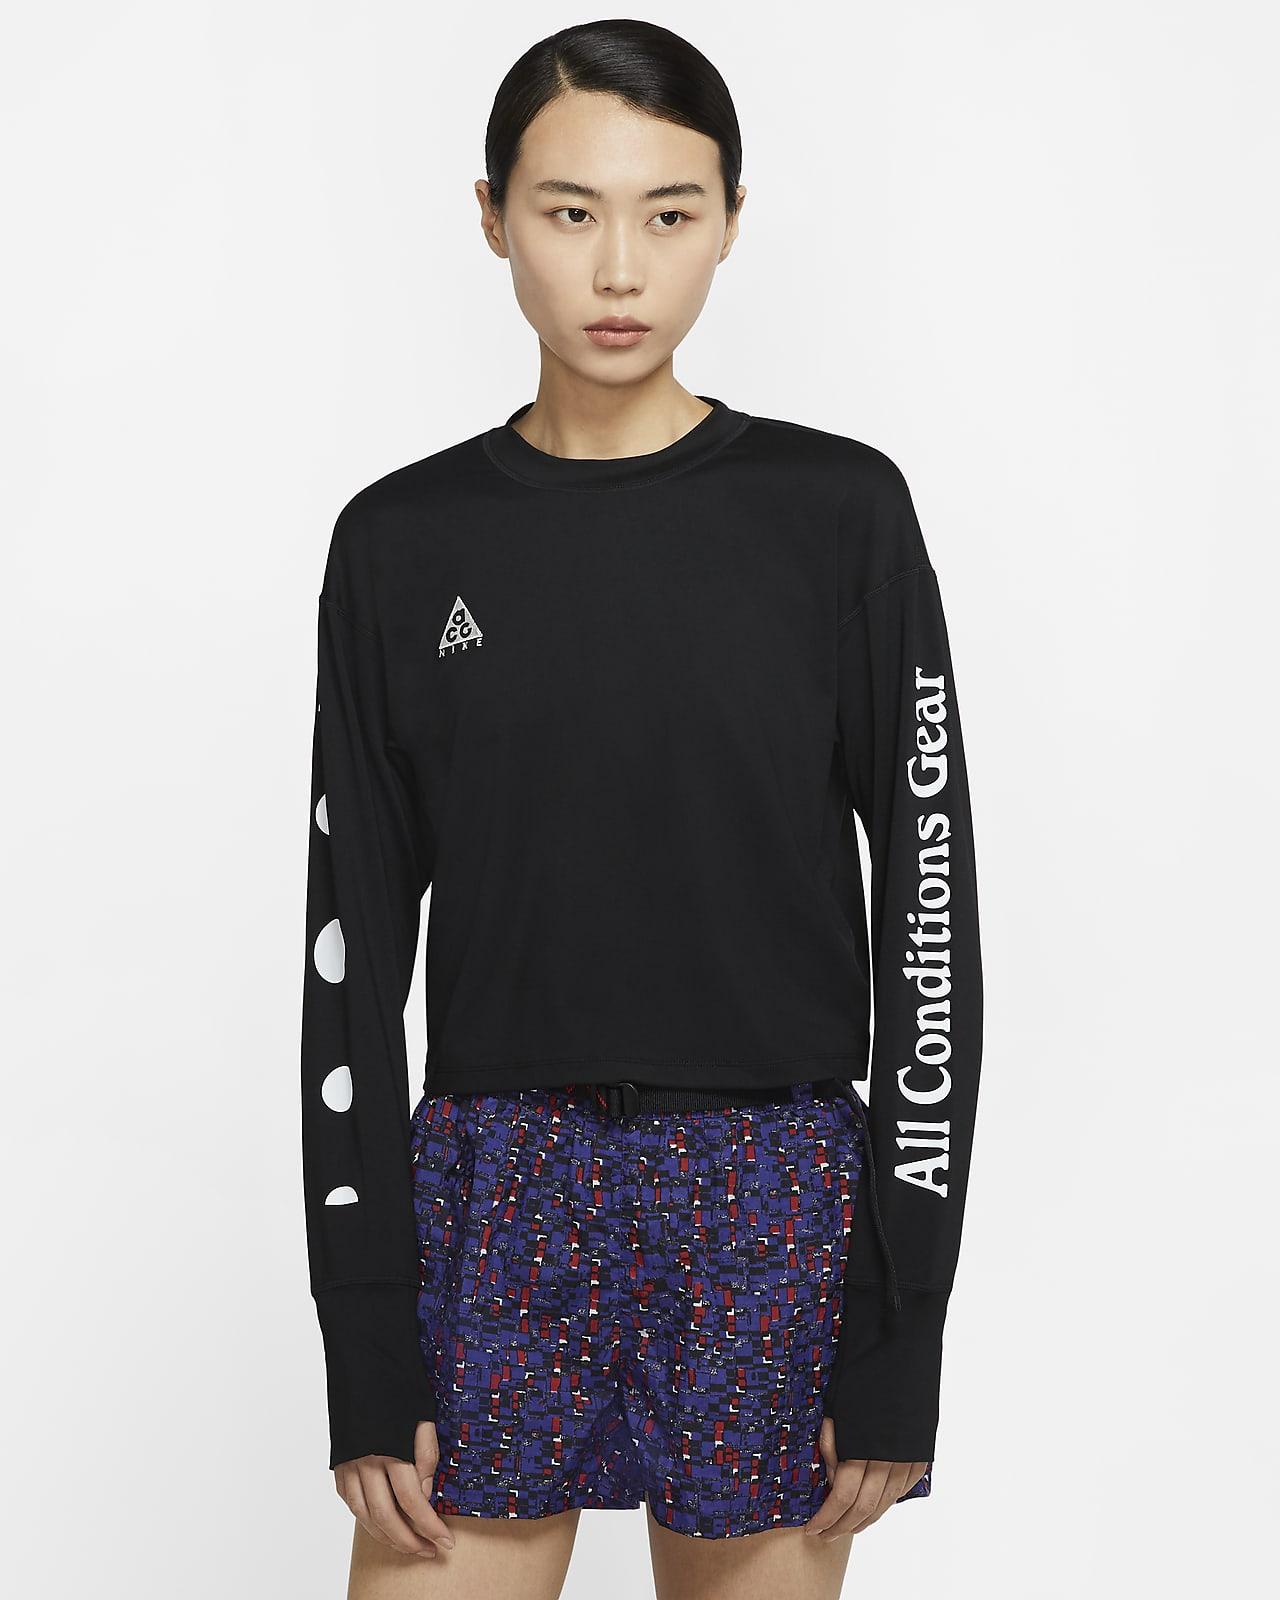 Nike ACG Women's Long-Sleeve UV Top